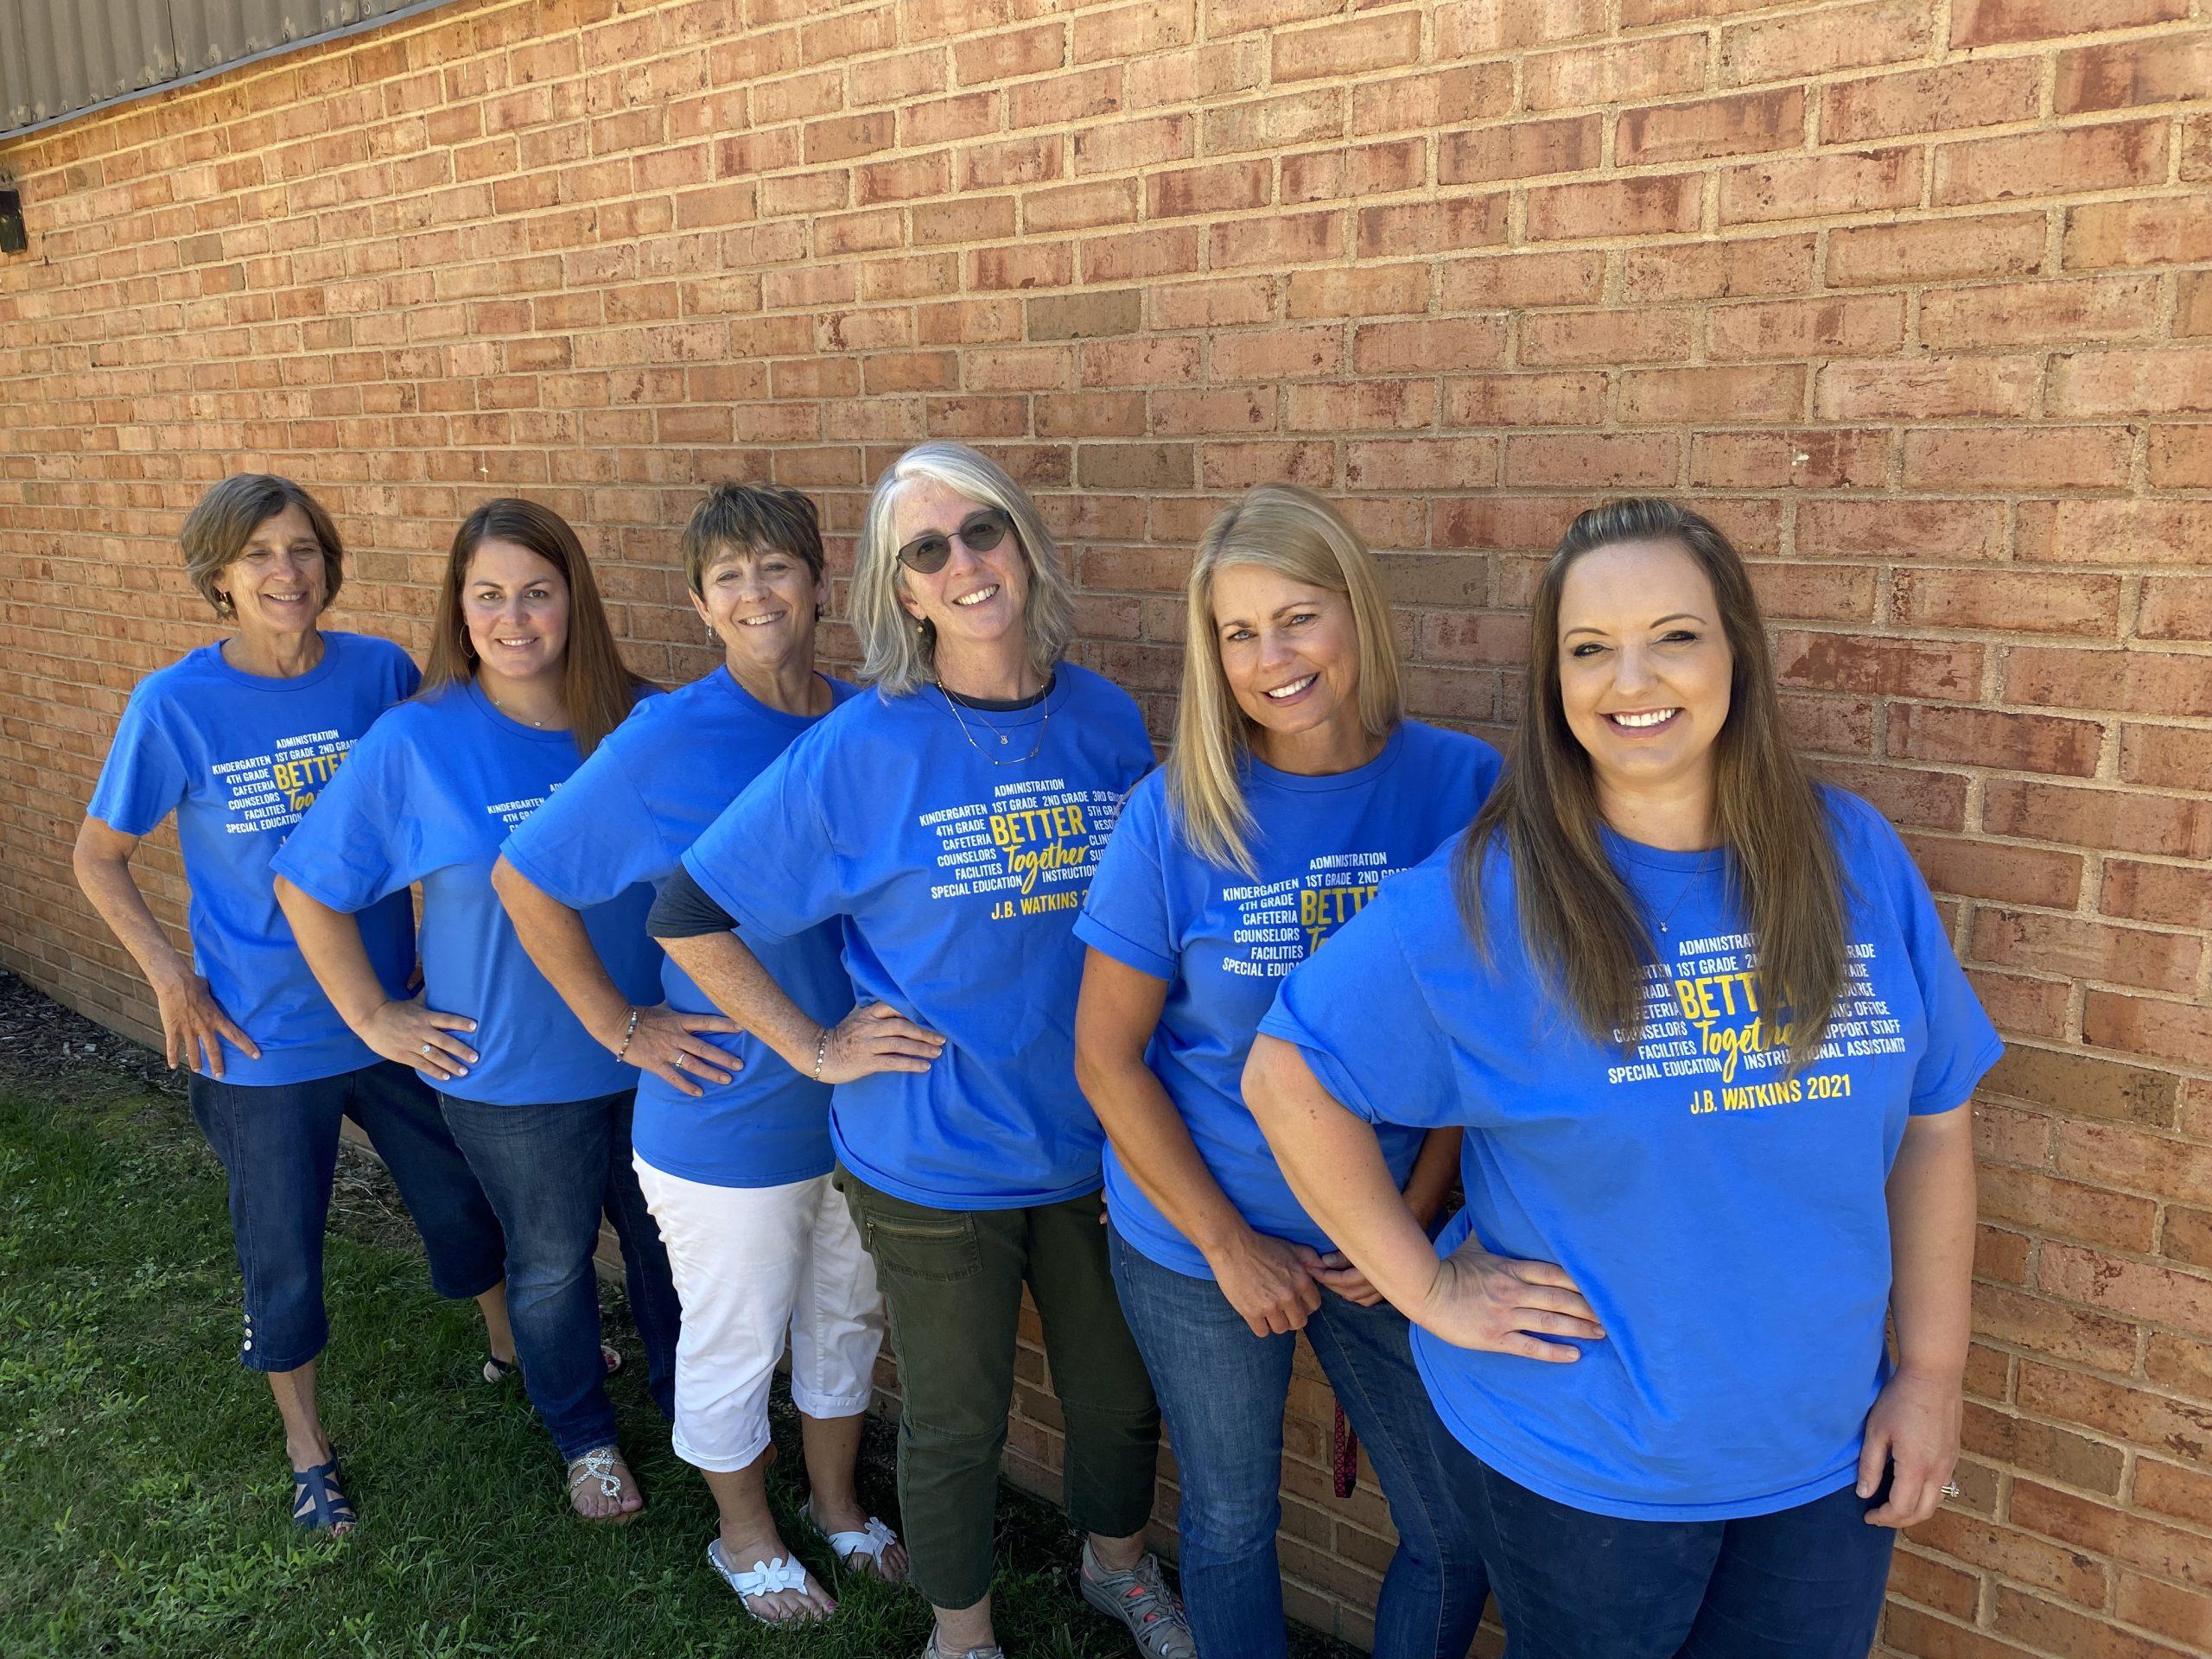 Five teachers lineup for a photo.